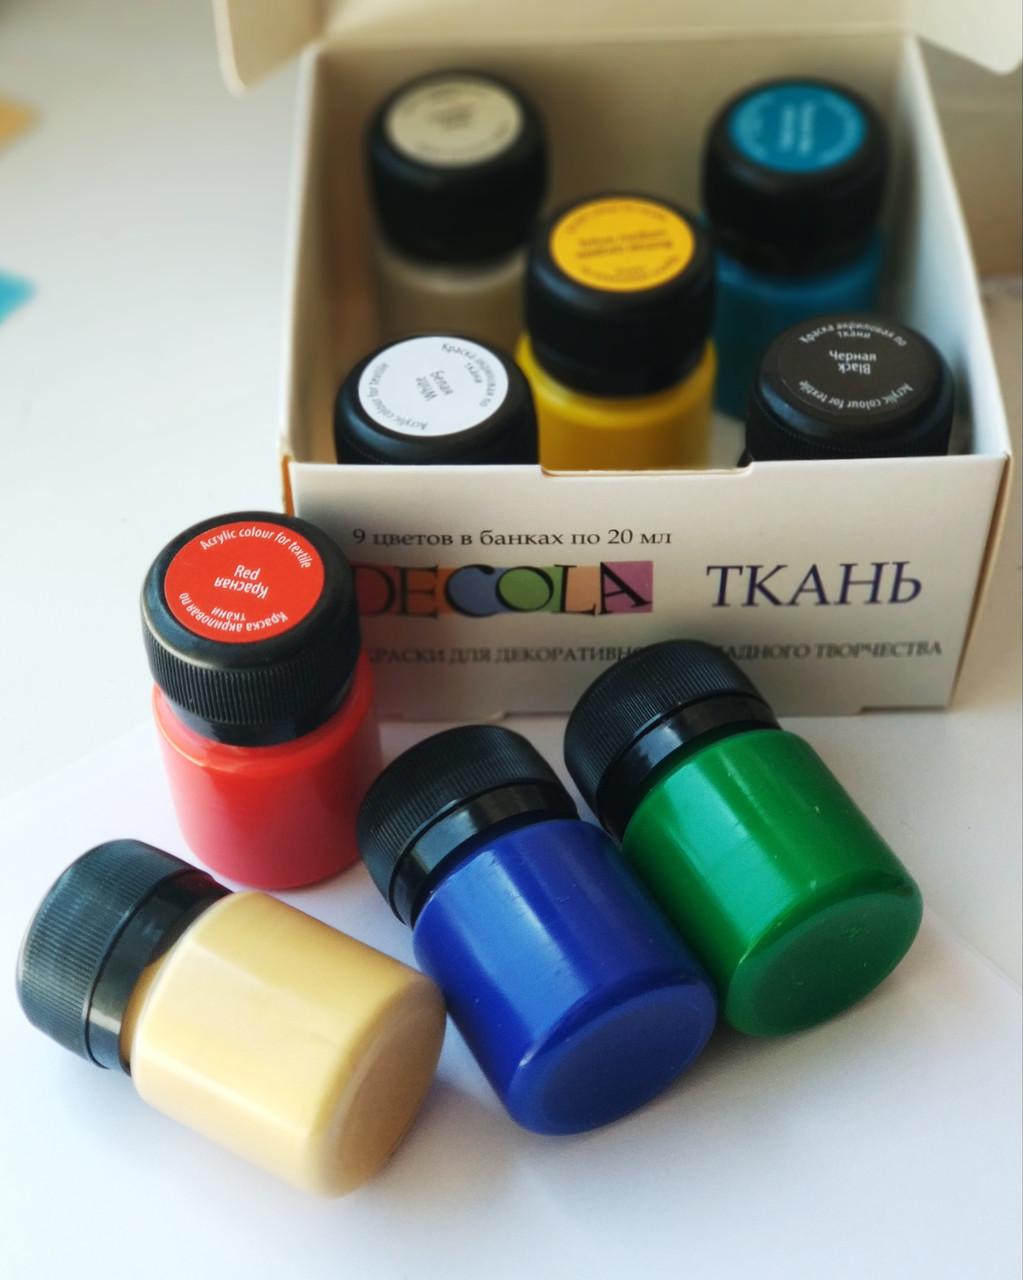 Краски Декола Decola для ткани набор 9 штук,акриловые краски по ткани